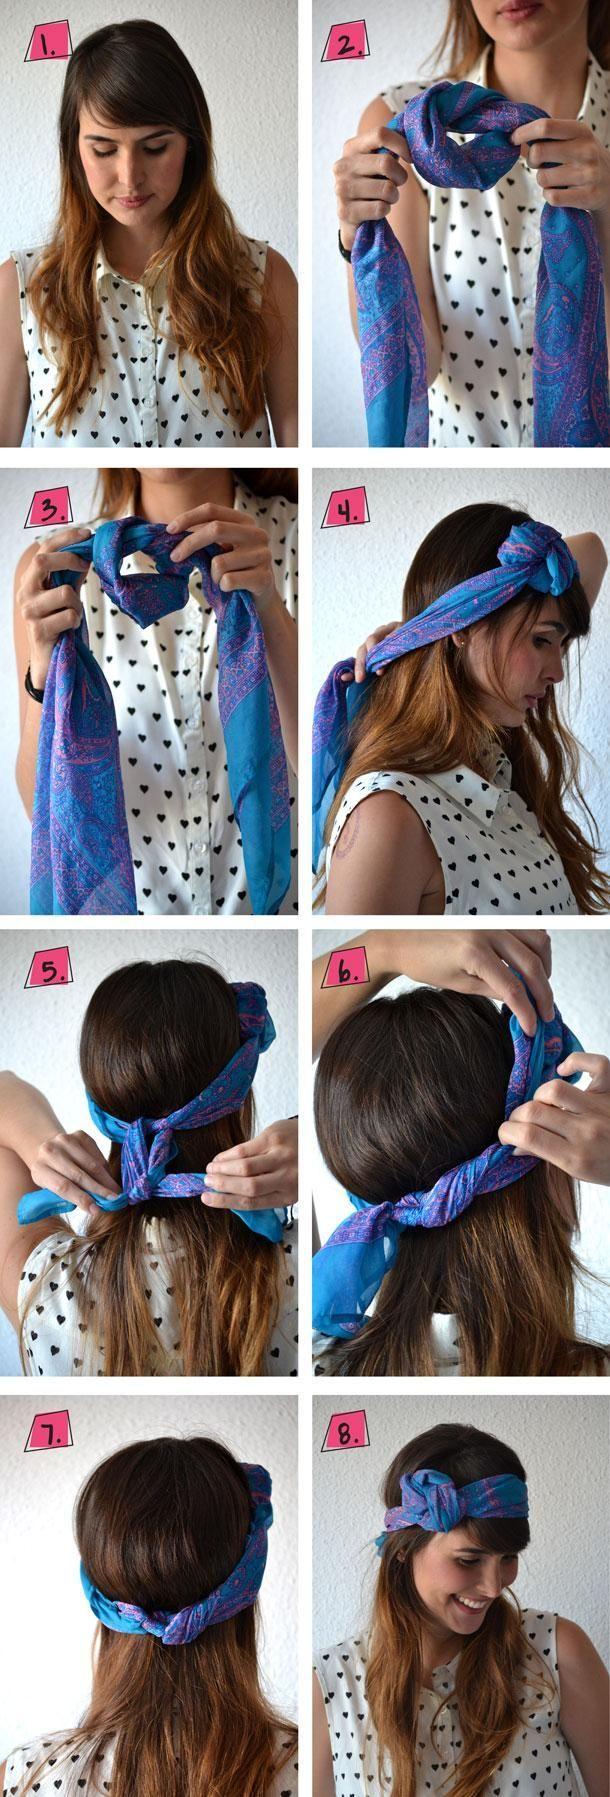 Cravate Bandana - 26 grands bandana firsuren avec instructions - -